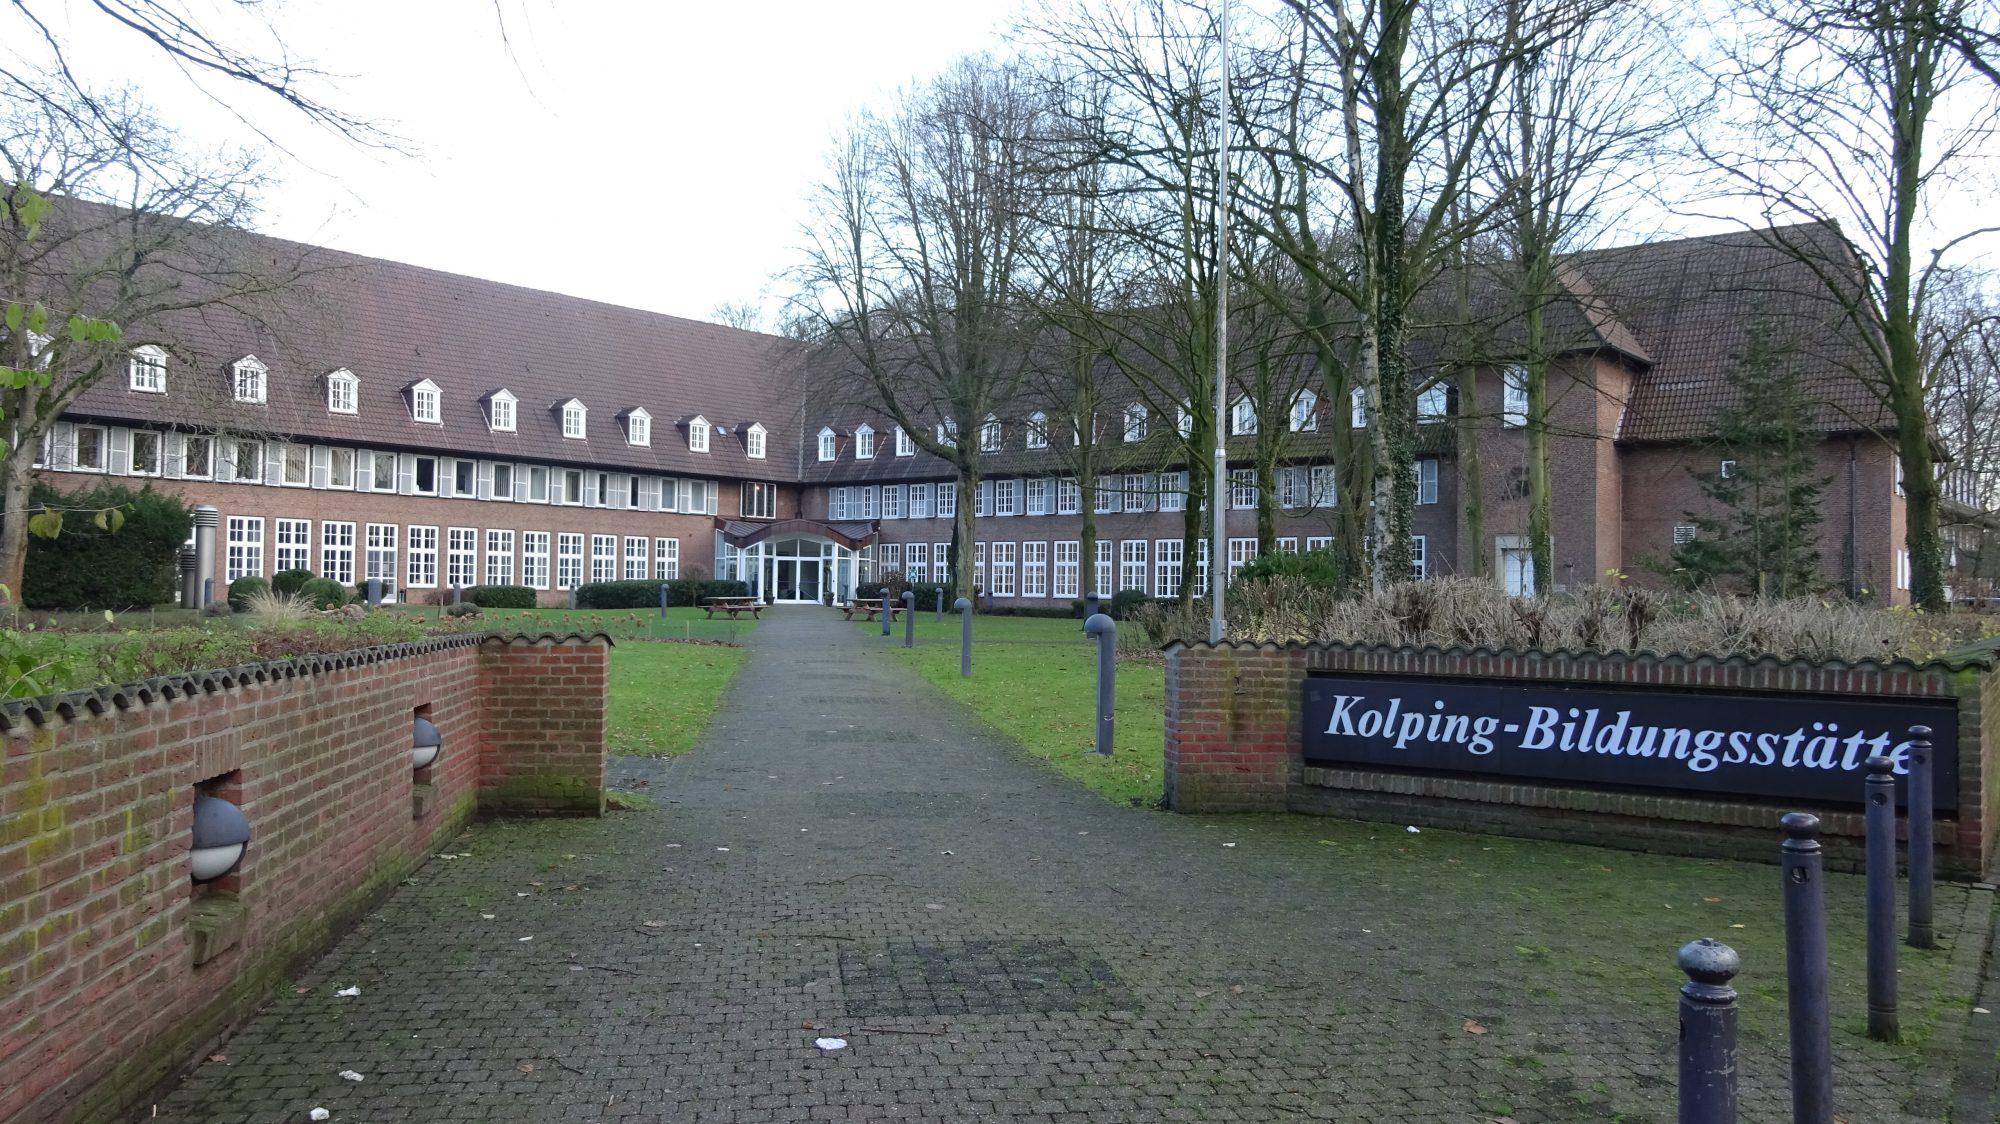 Kolping Bildungsstätte Coesfeld GmbH